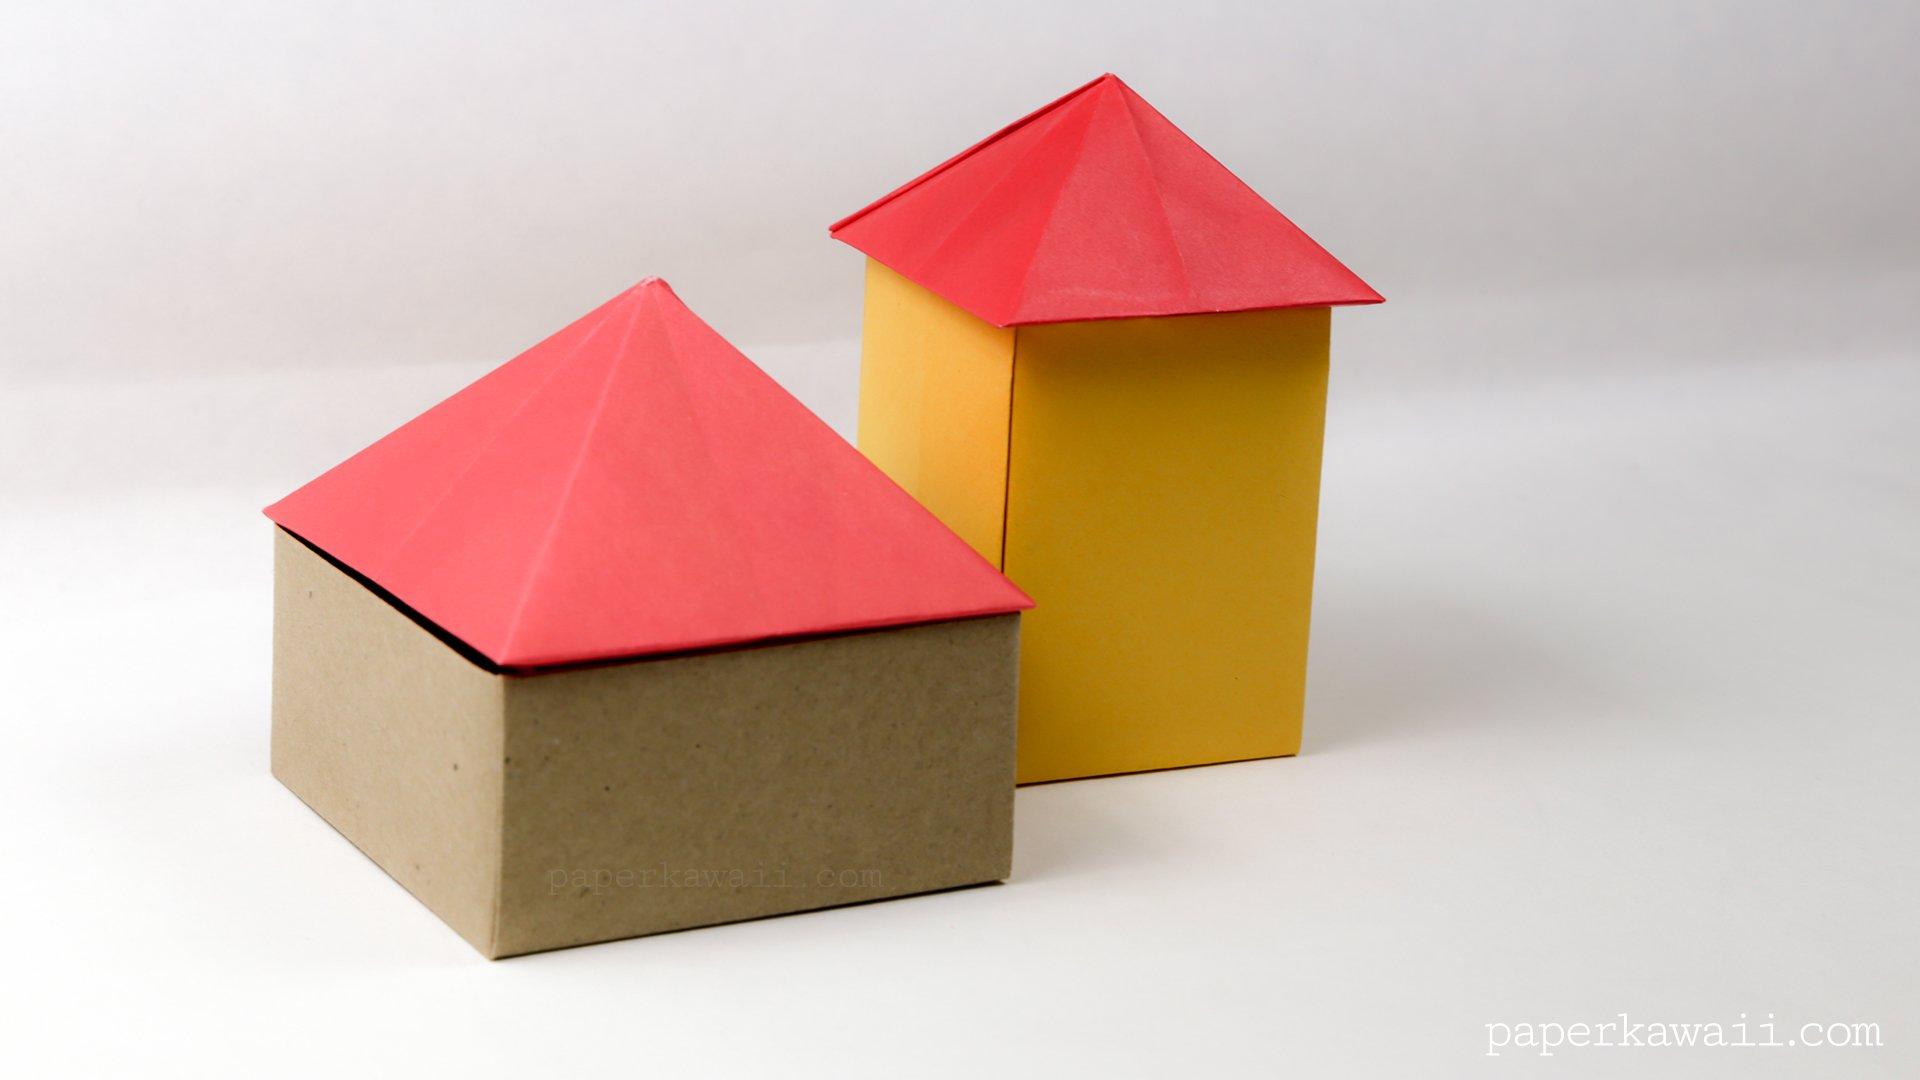 Origami Square Pyramid - House Lid - Paper Kawaii